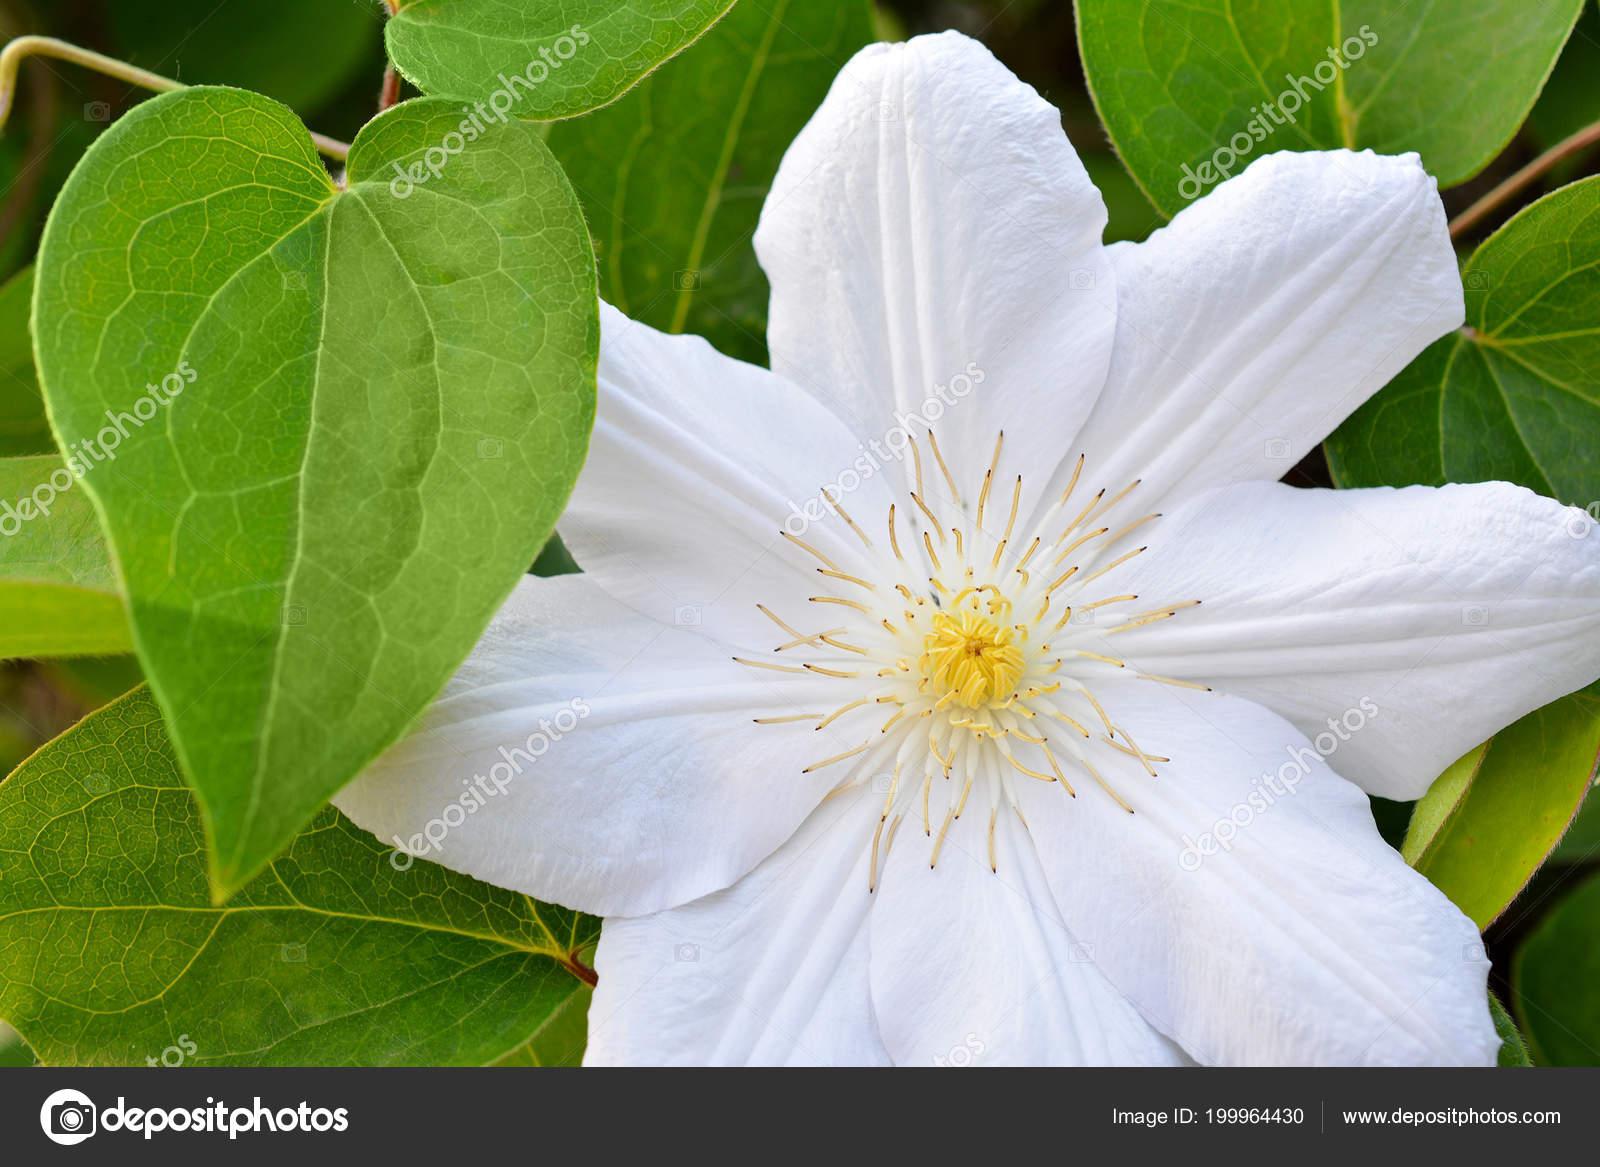 Flower White Clematis Spring Garden Bush White Clematis Stock